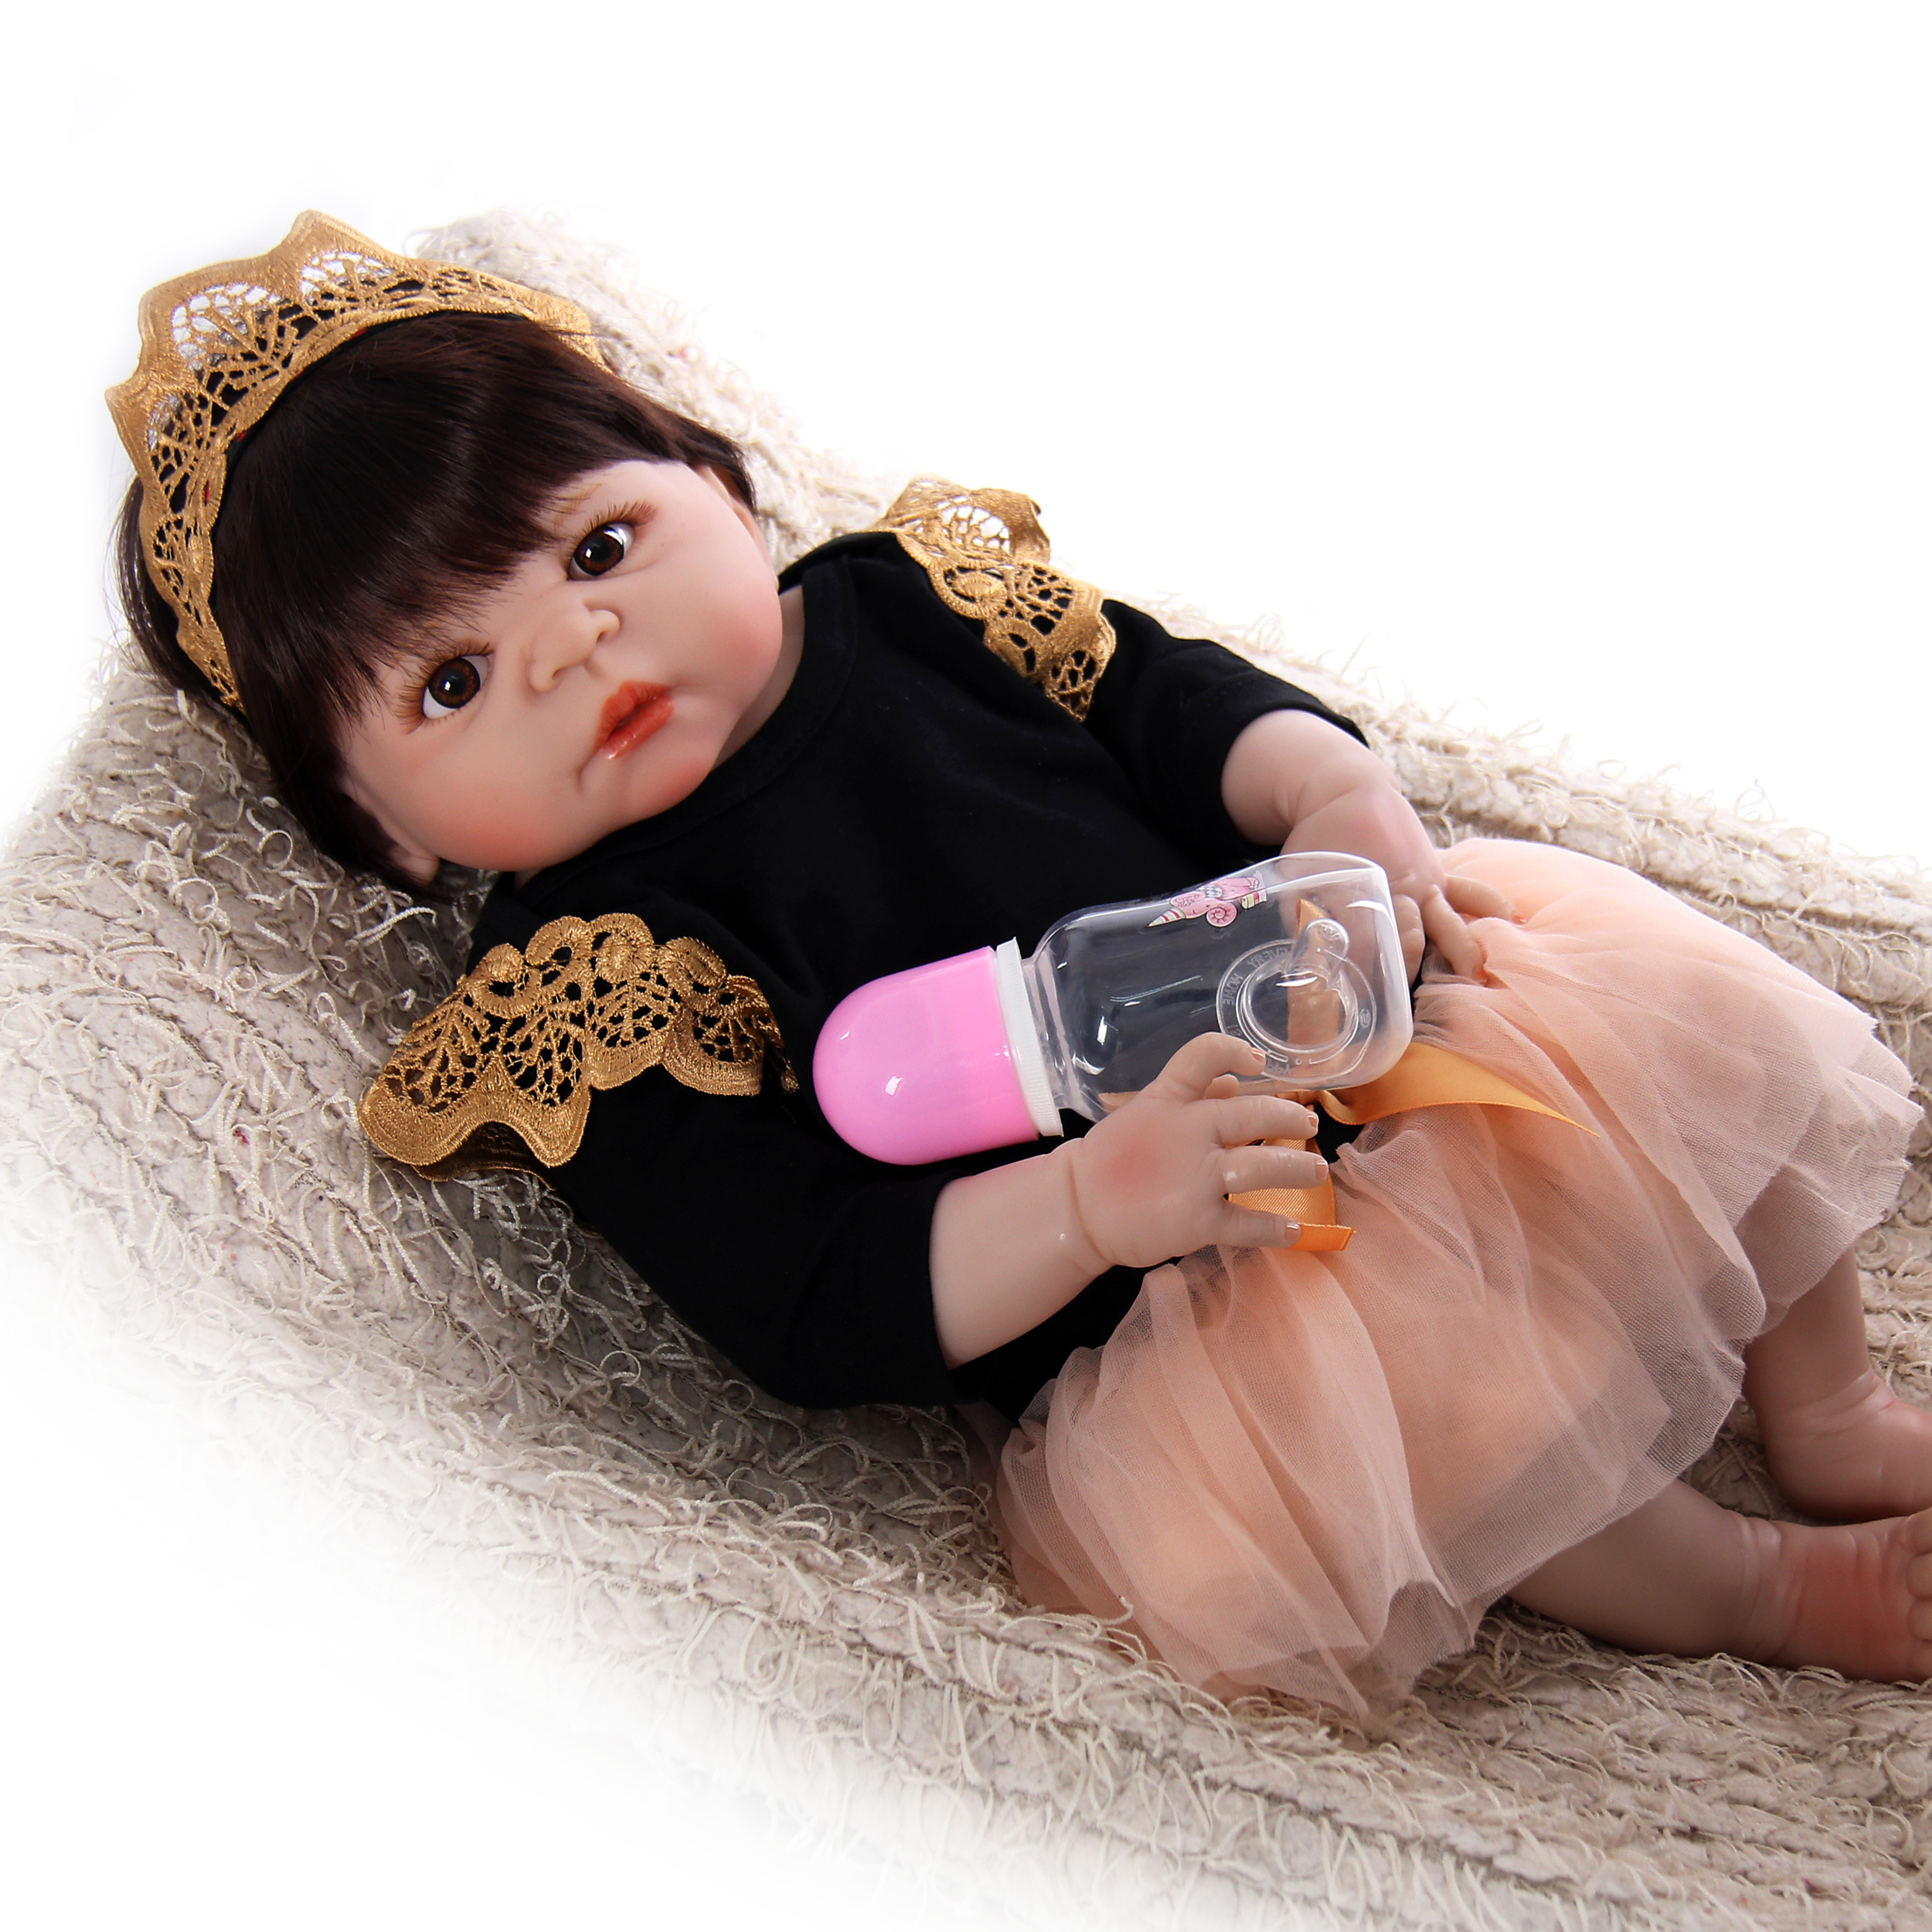 Hot Sale Full Silicone Vinyl Body Reborn Boneca So Truly Princess 23 inch Baby Girl Babies